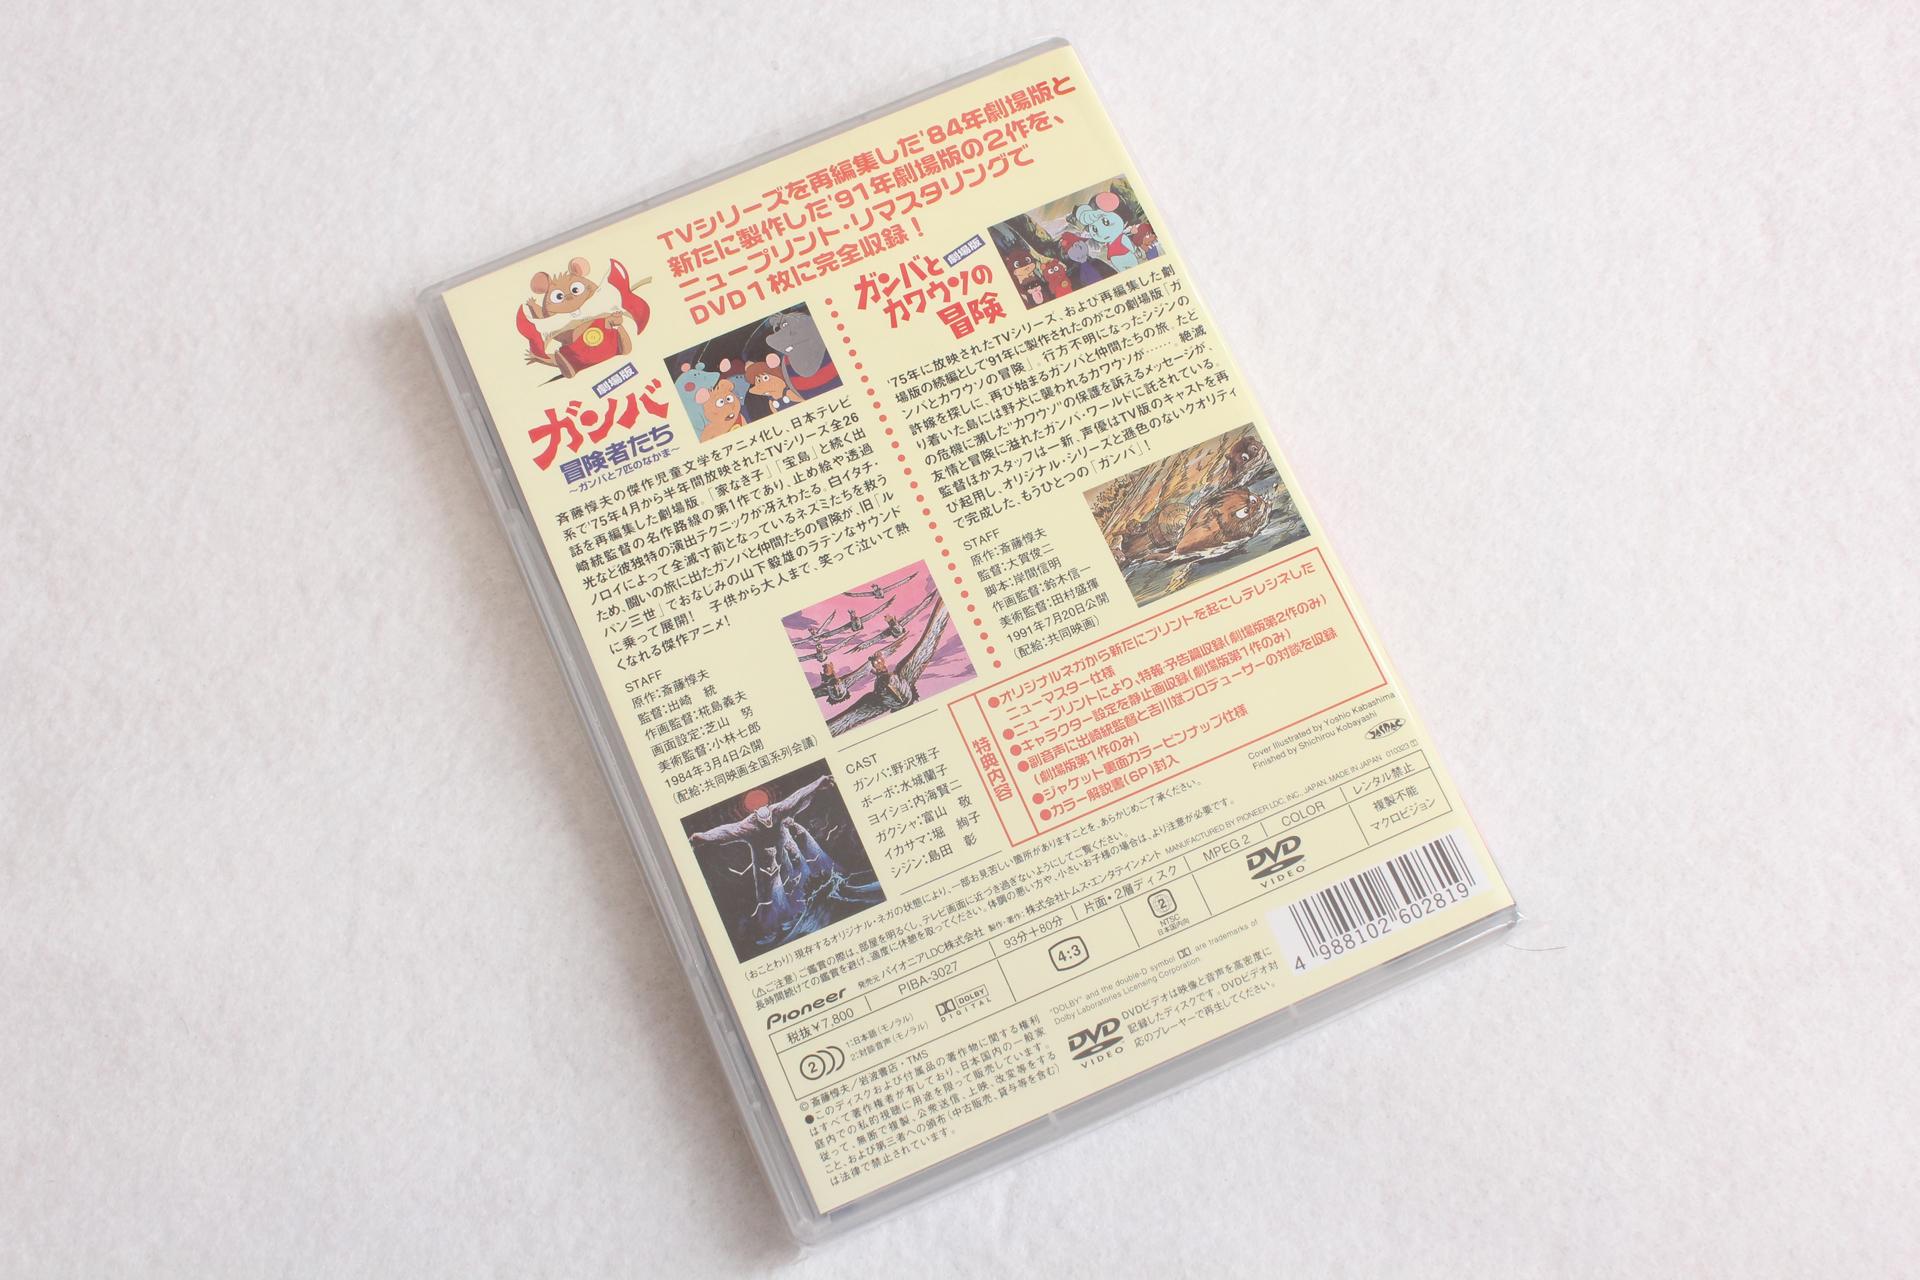 2014-12-26-GAMBA_BD-18.JPG